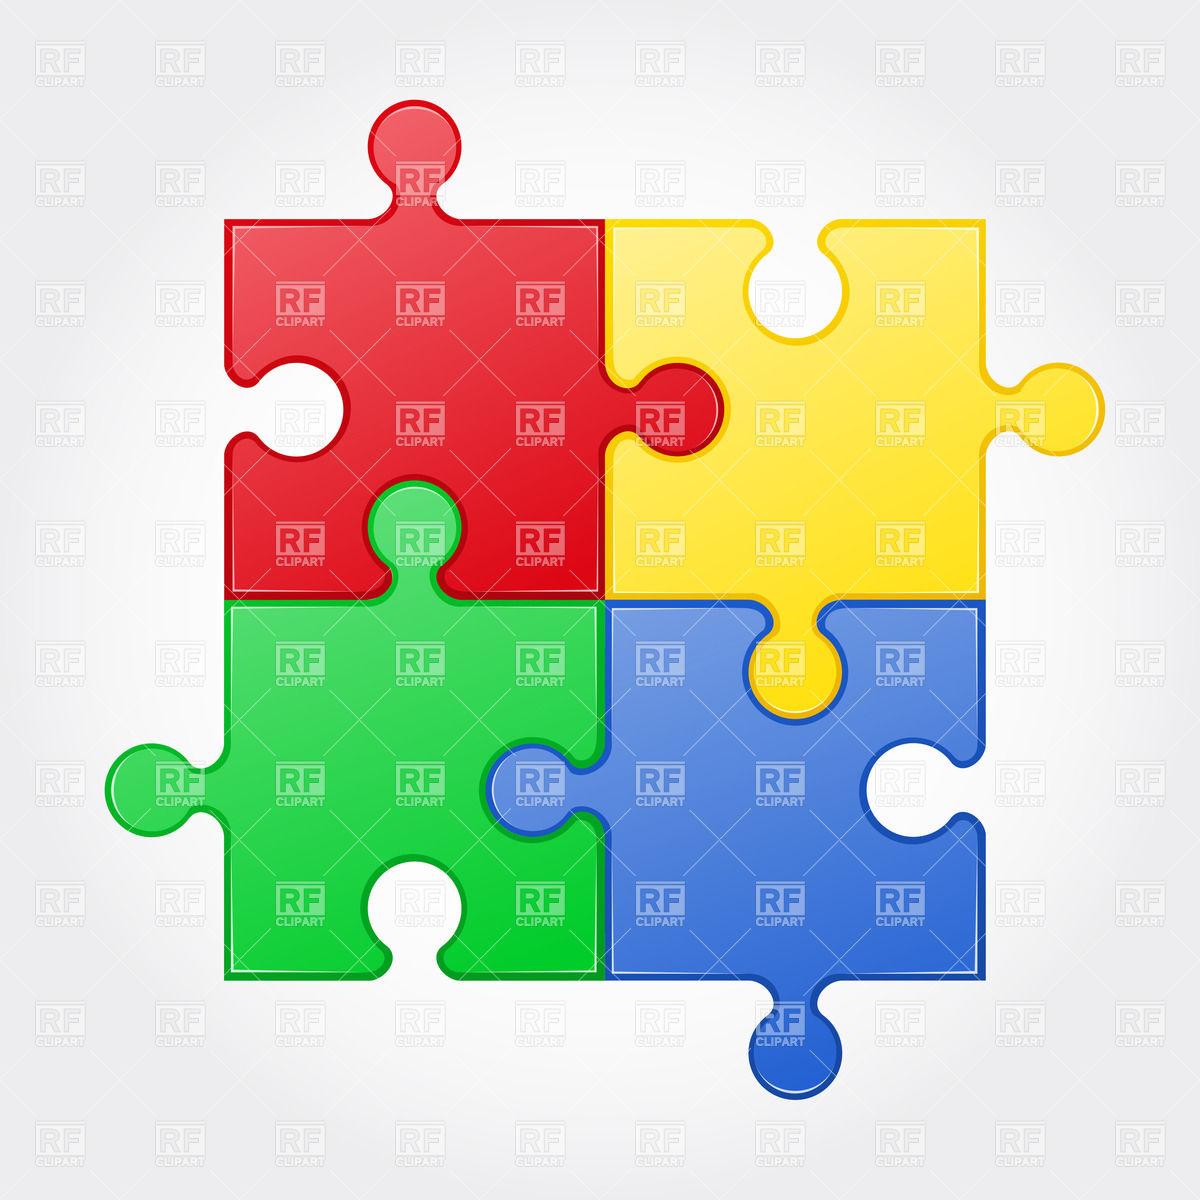 1200x1200 Colour Square Jigsaw Puzzle Elements Vector Image Vector Artwork